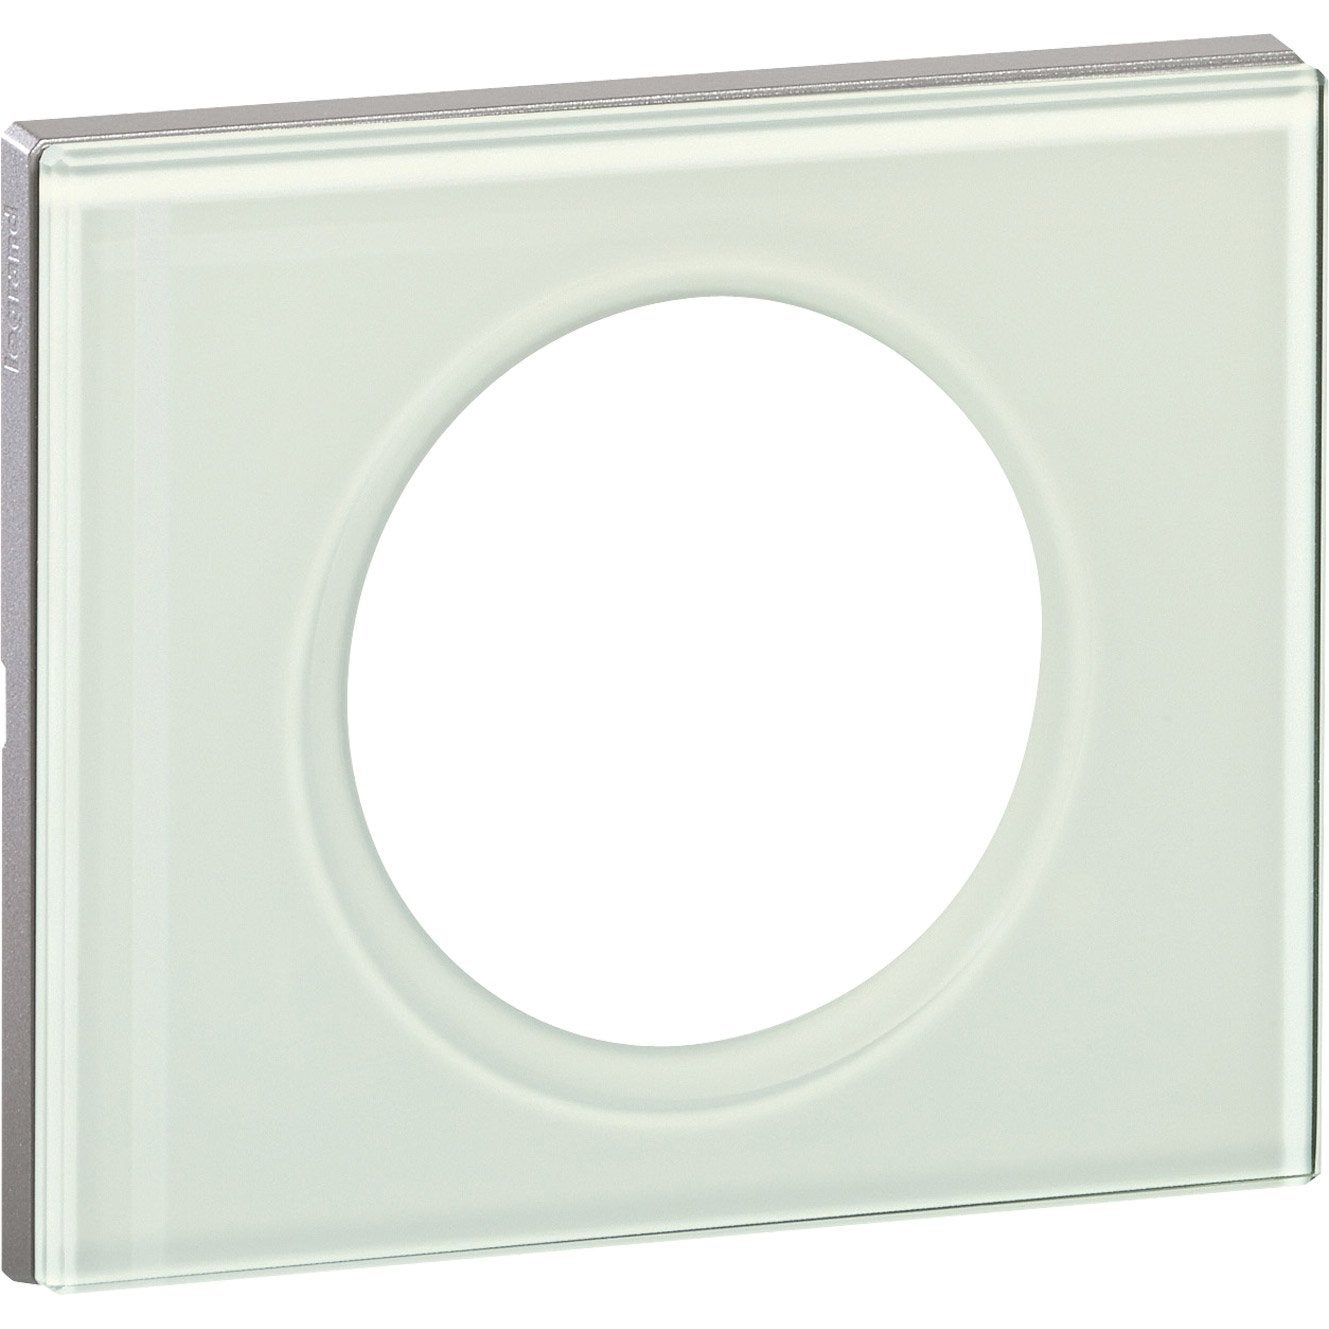 plaque simple c liane legrand verre kaolin leroy merlin. Black Bedroom Furniture Sets. Home Design Ideas